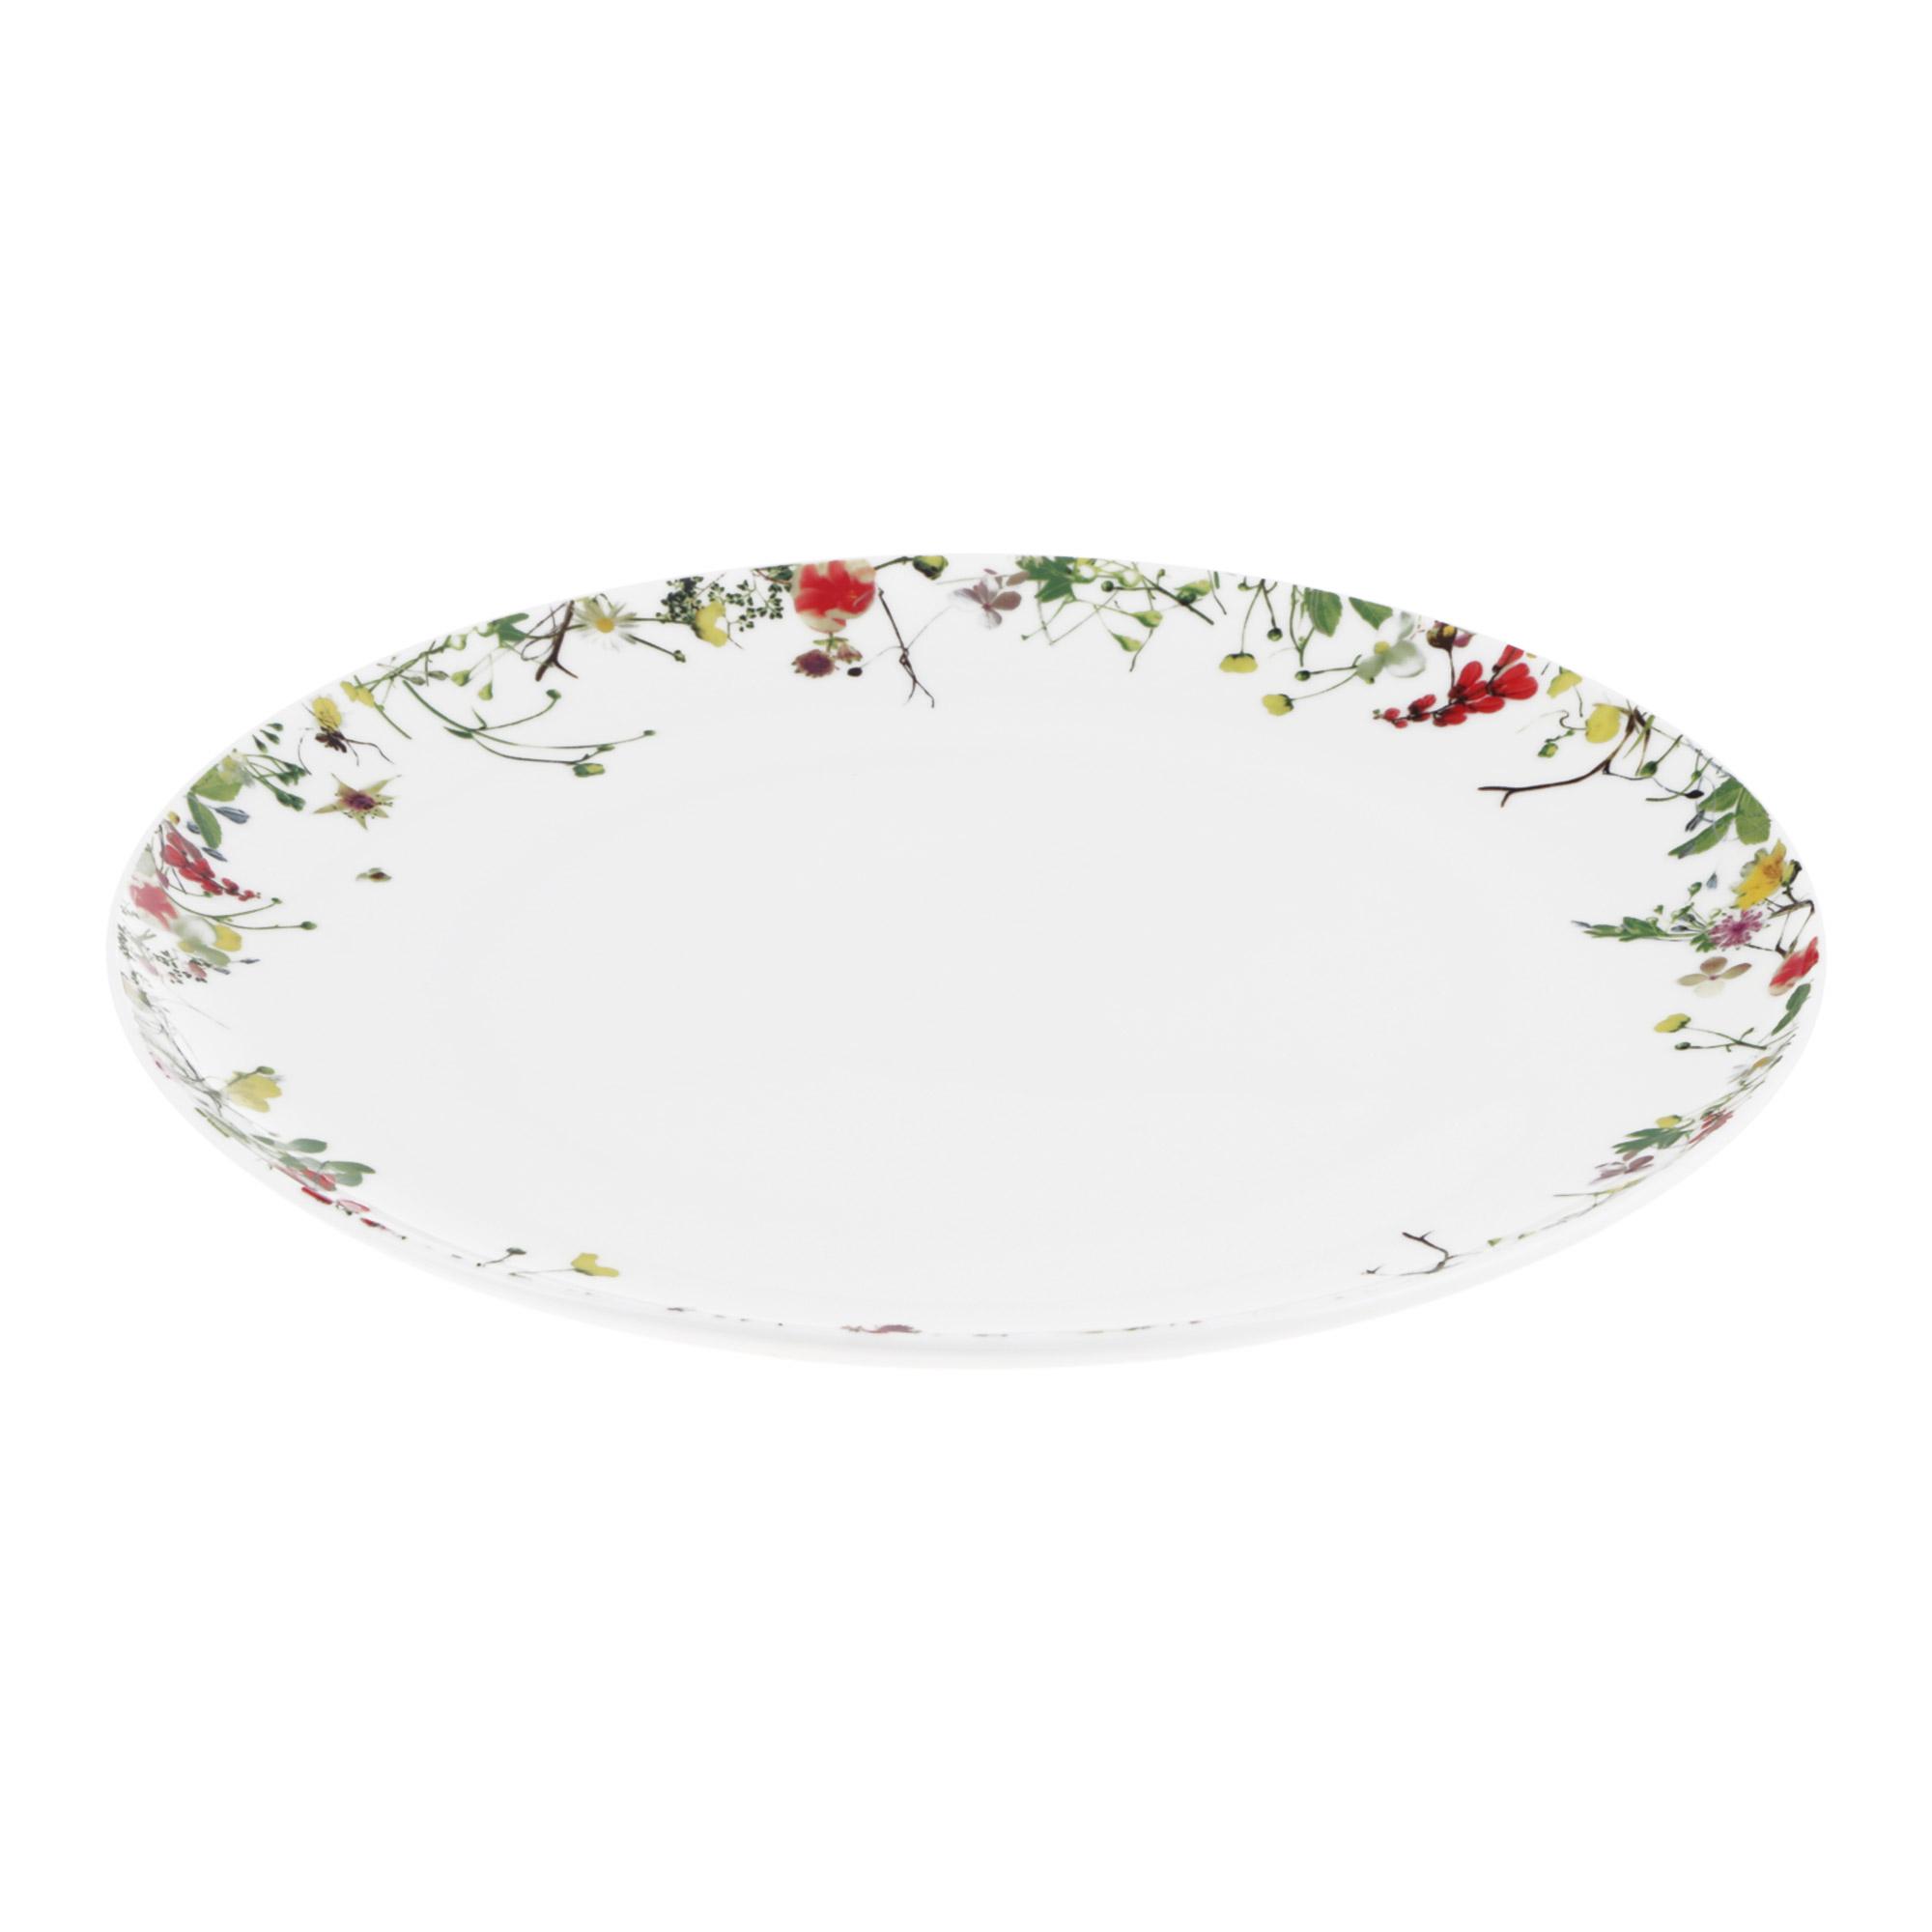 rosenthal selection brillance fleurs sauvages тарелка coup 27 см Тарелка обеденная 27см Rosenthal дикие цветы